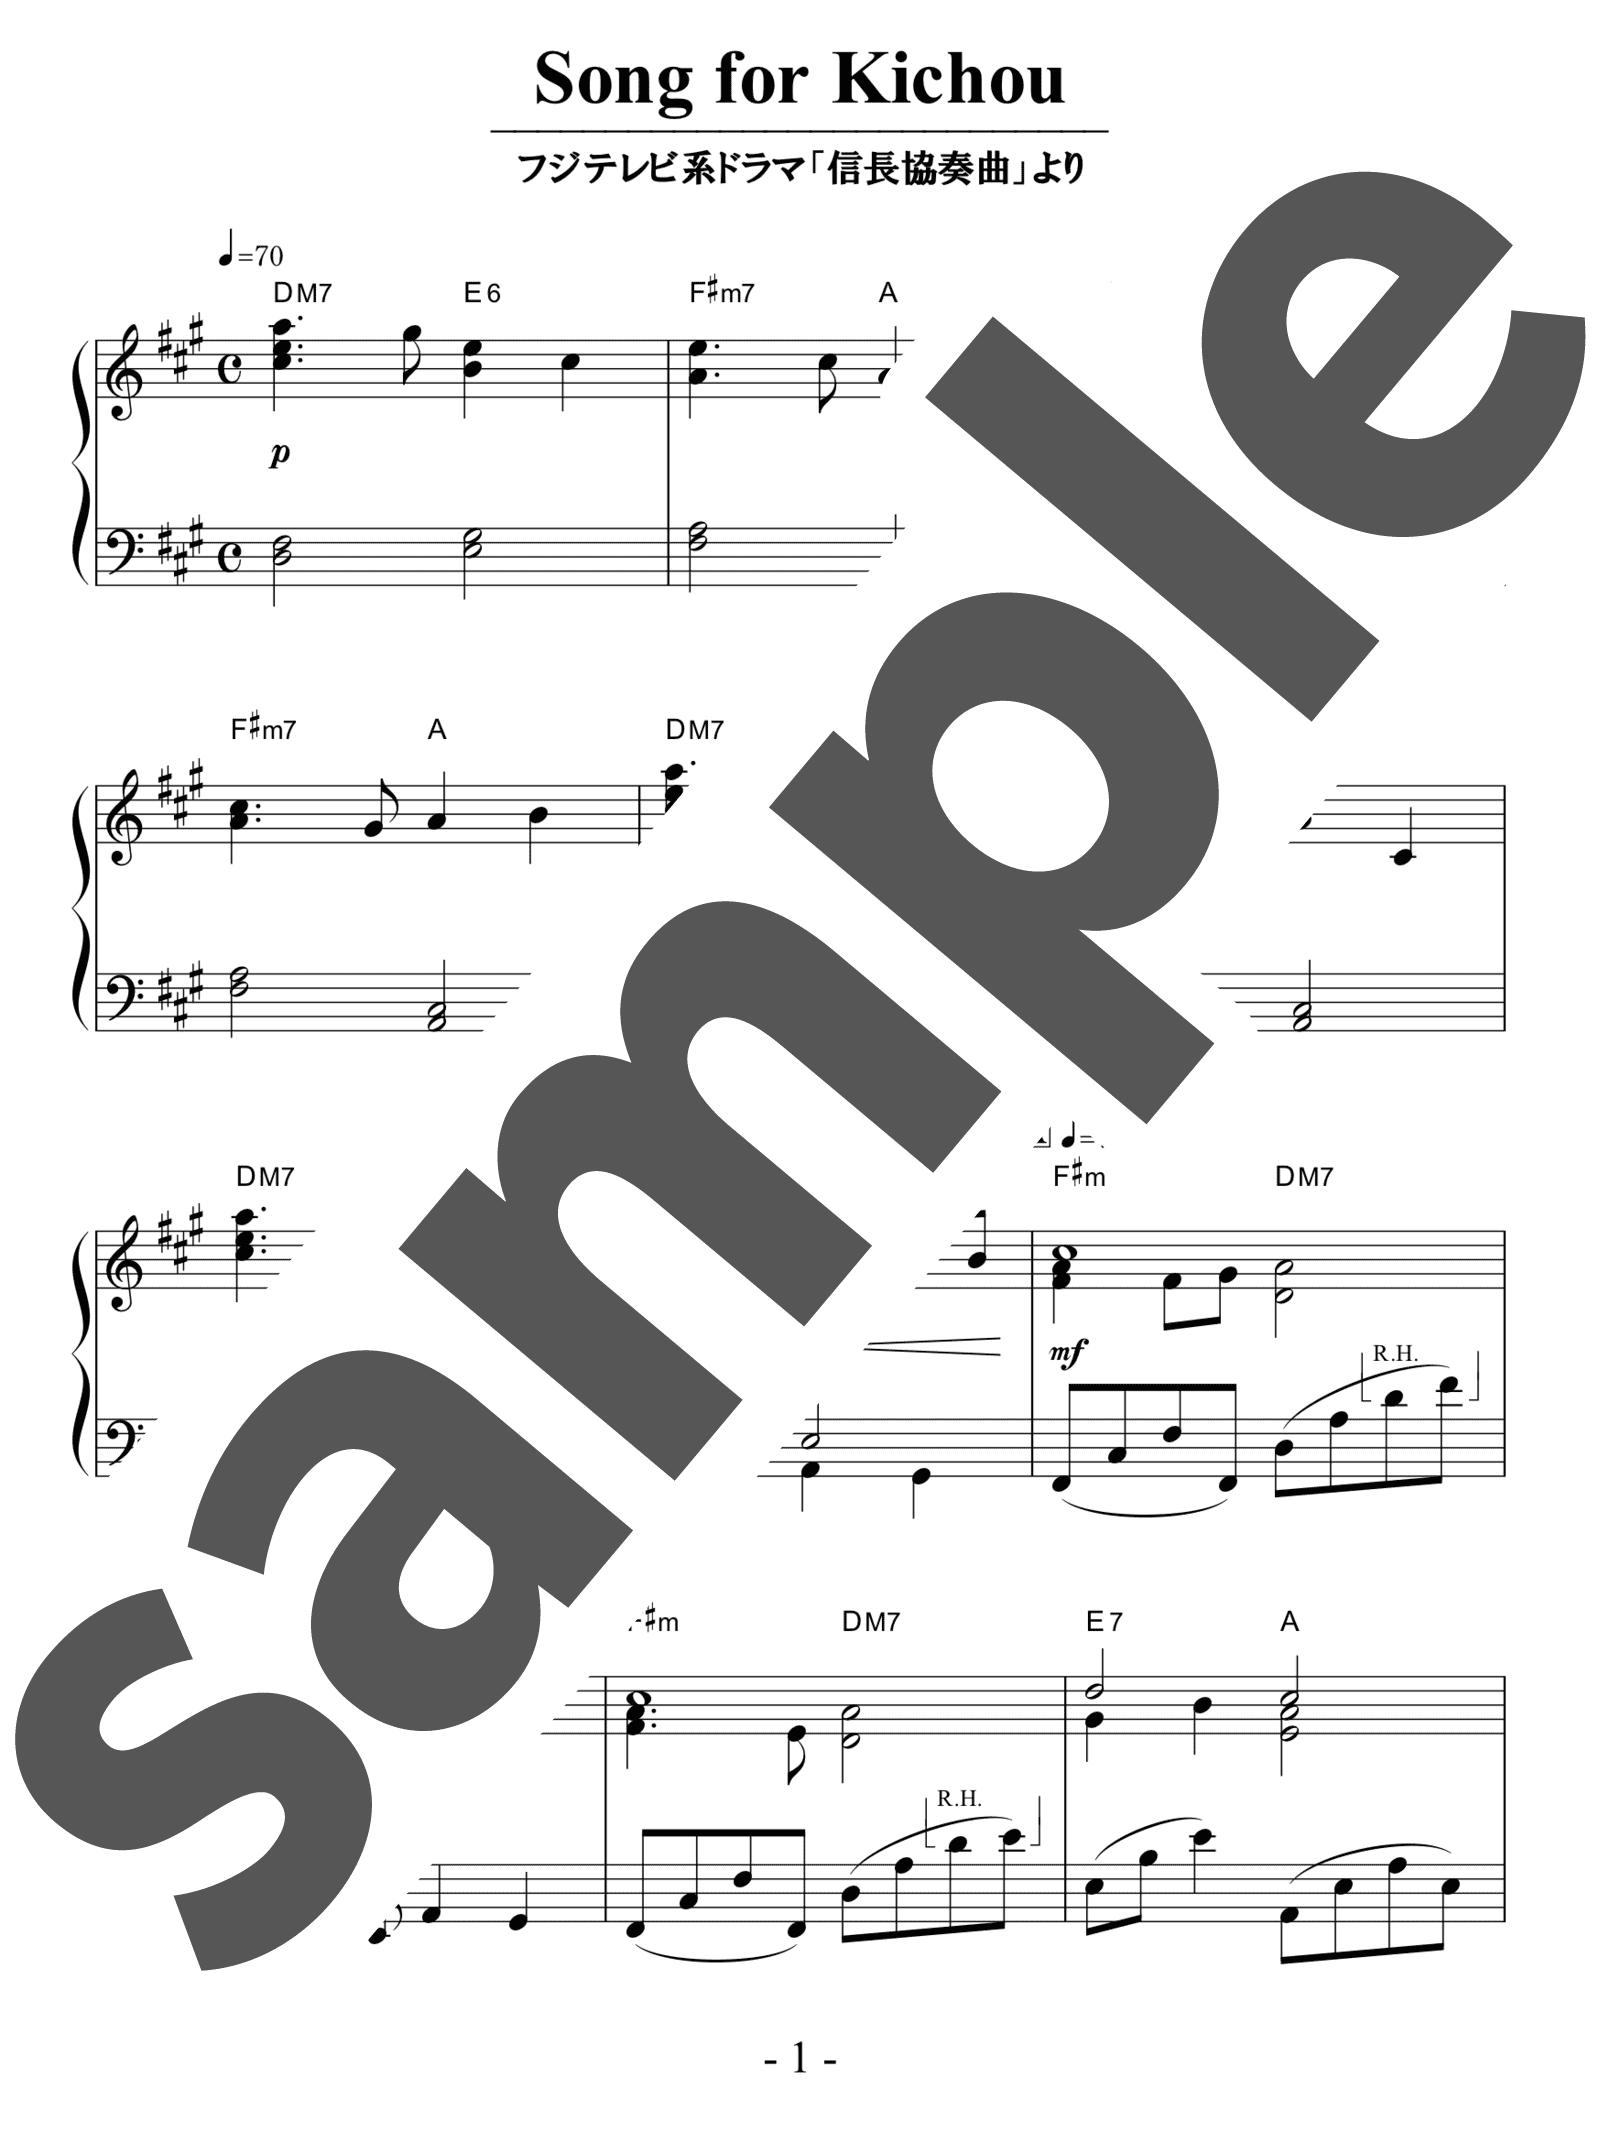 「Song for Kichou」のサンプル楽譜